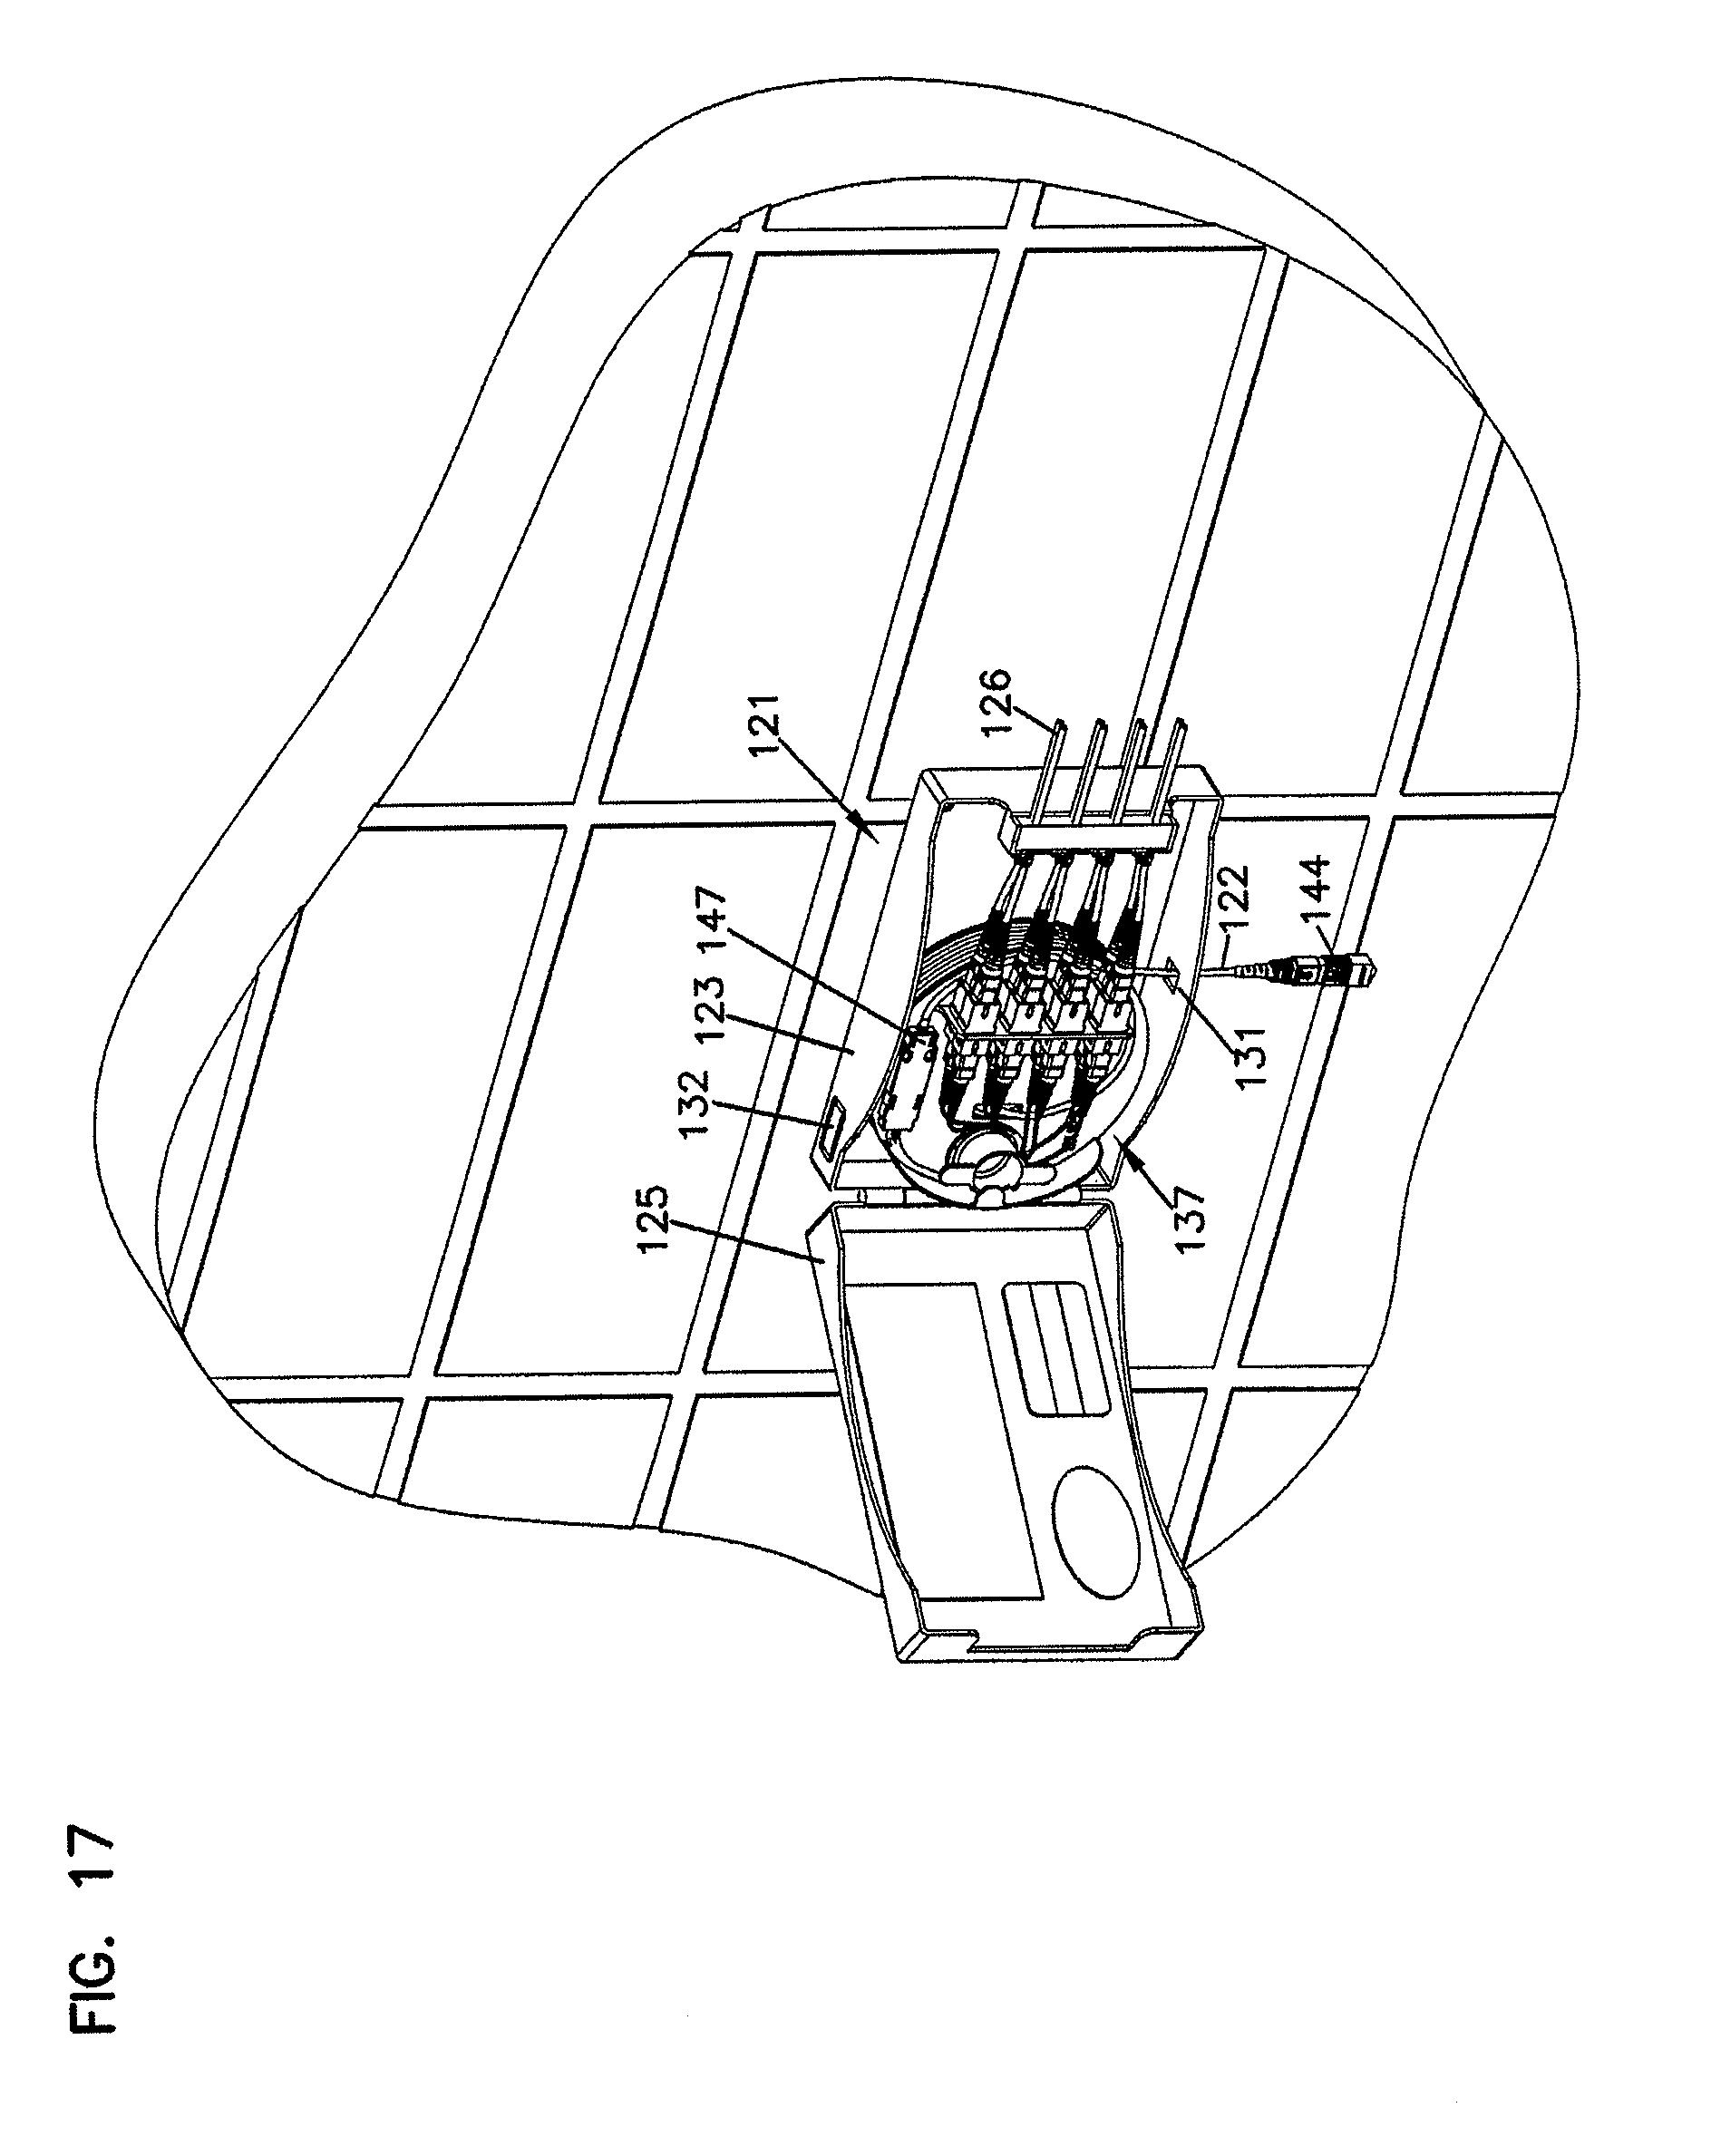 u5c08 u5229 us8705929 - fiber optic enclosure with internal cable spool